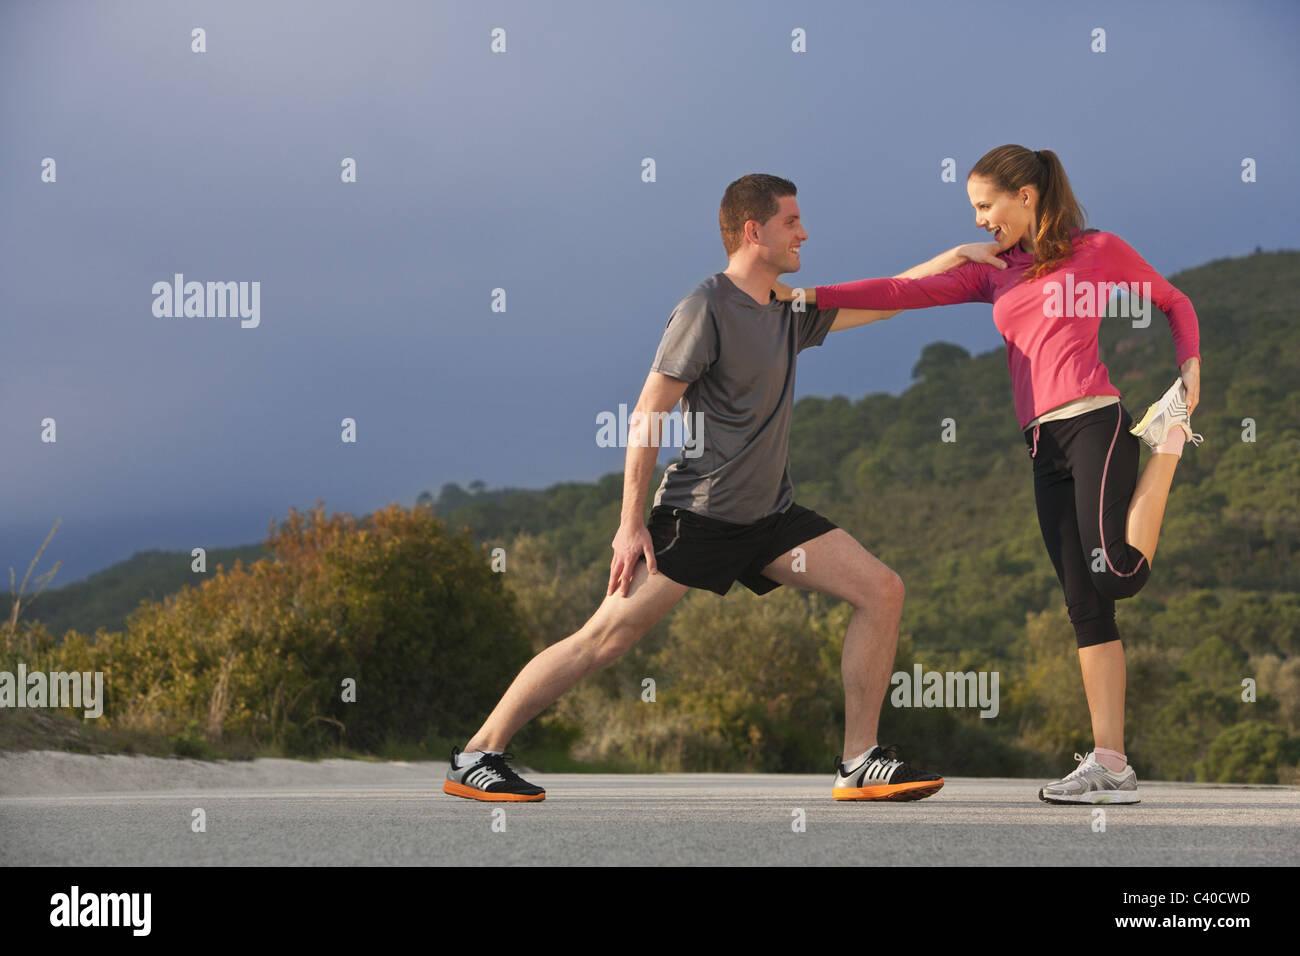 Joven pareja atlética estiramientos Imagen De Stock